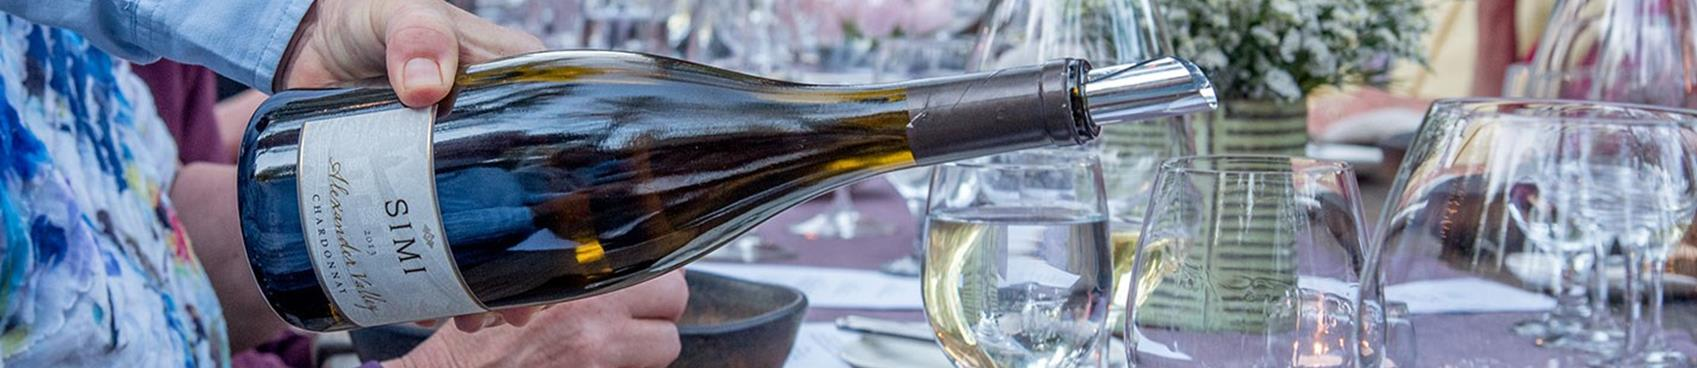 Vino e Cibo Anno Settimo - Celebration Of Spring-Wine Maker Dinner 2020